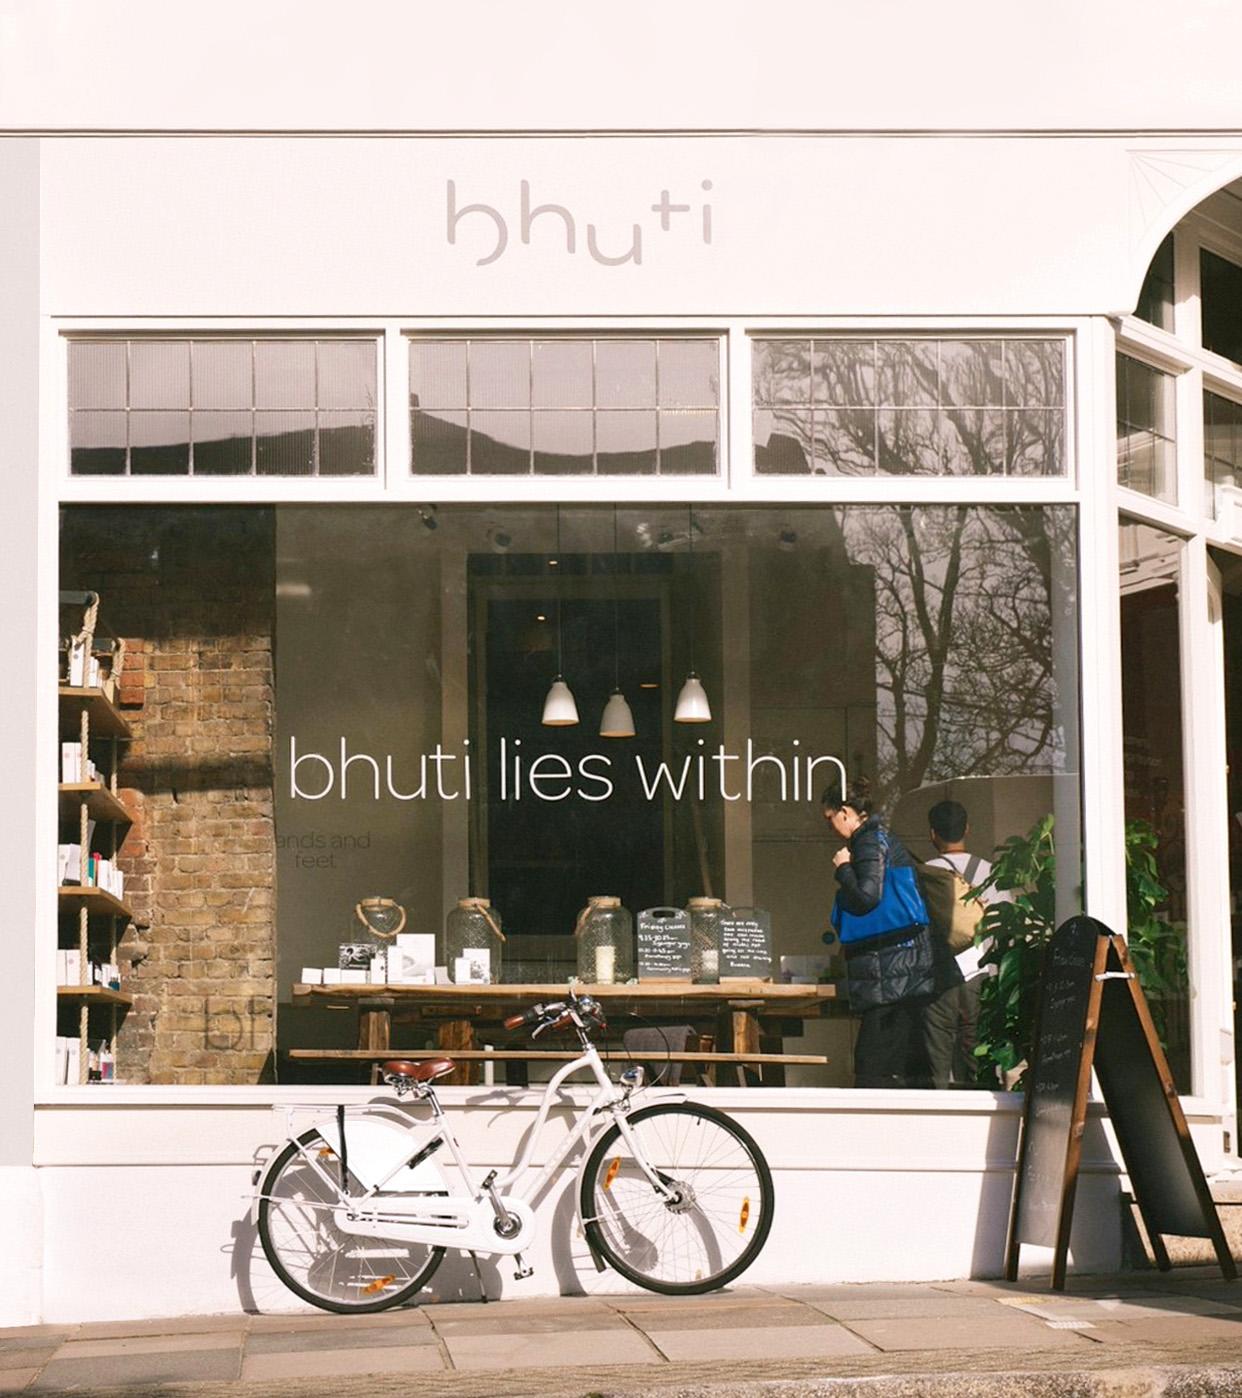 BHUTI urban retreat - interior design by Caulder Moore 1.jpg